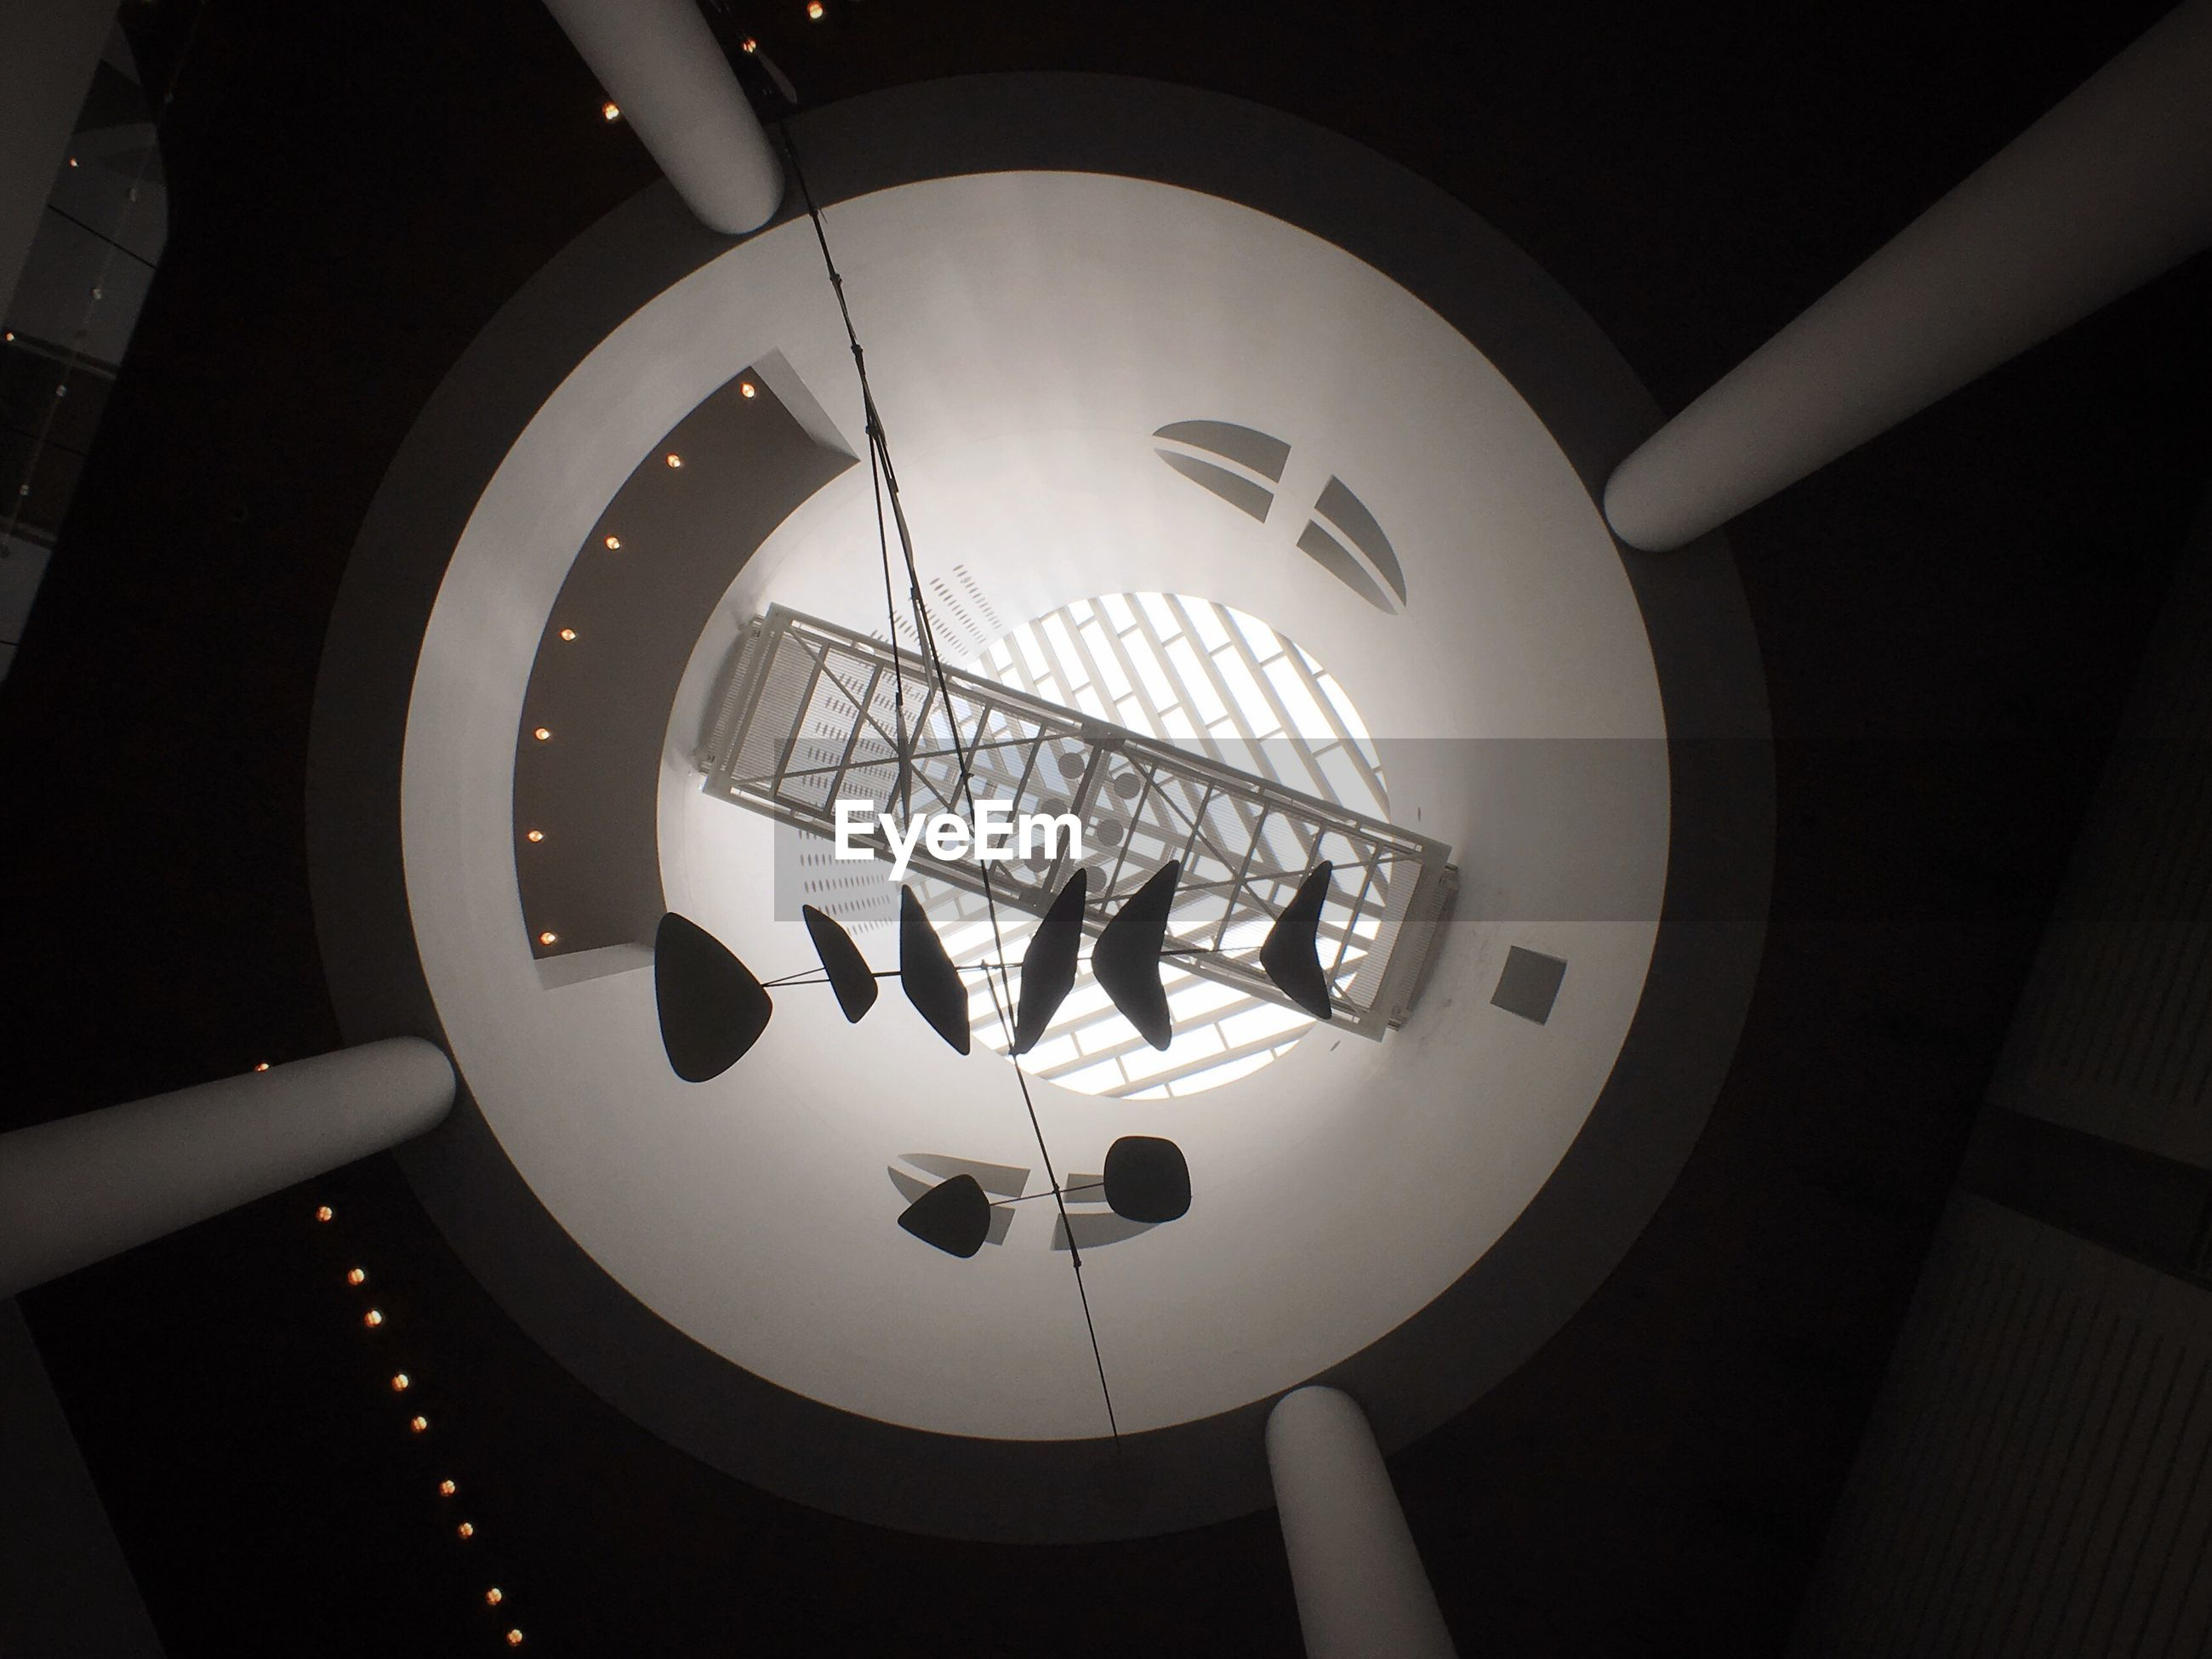 Skylight at san francisco museum of modern art